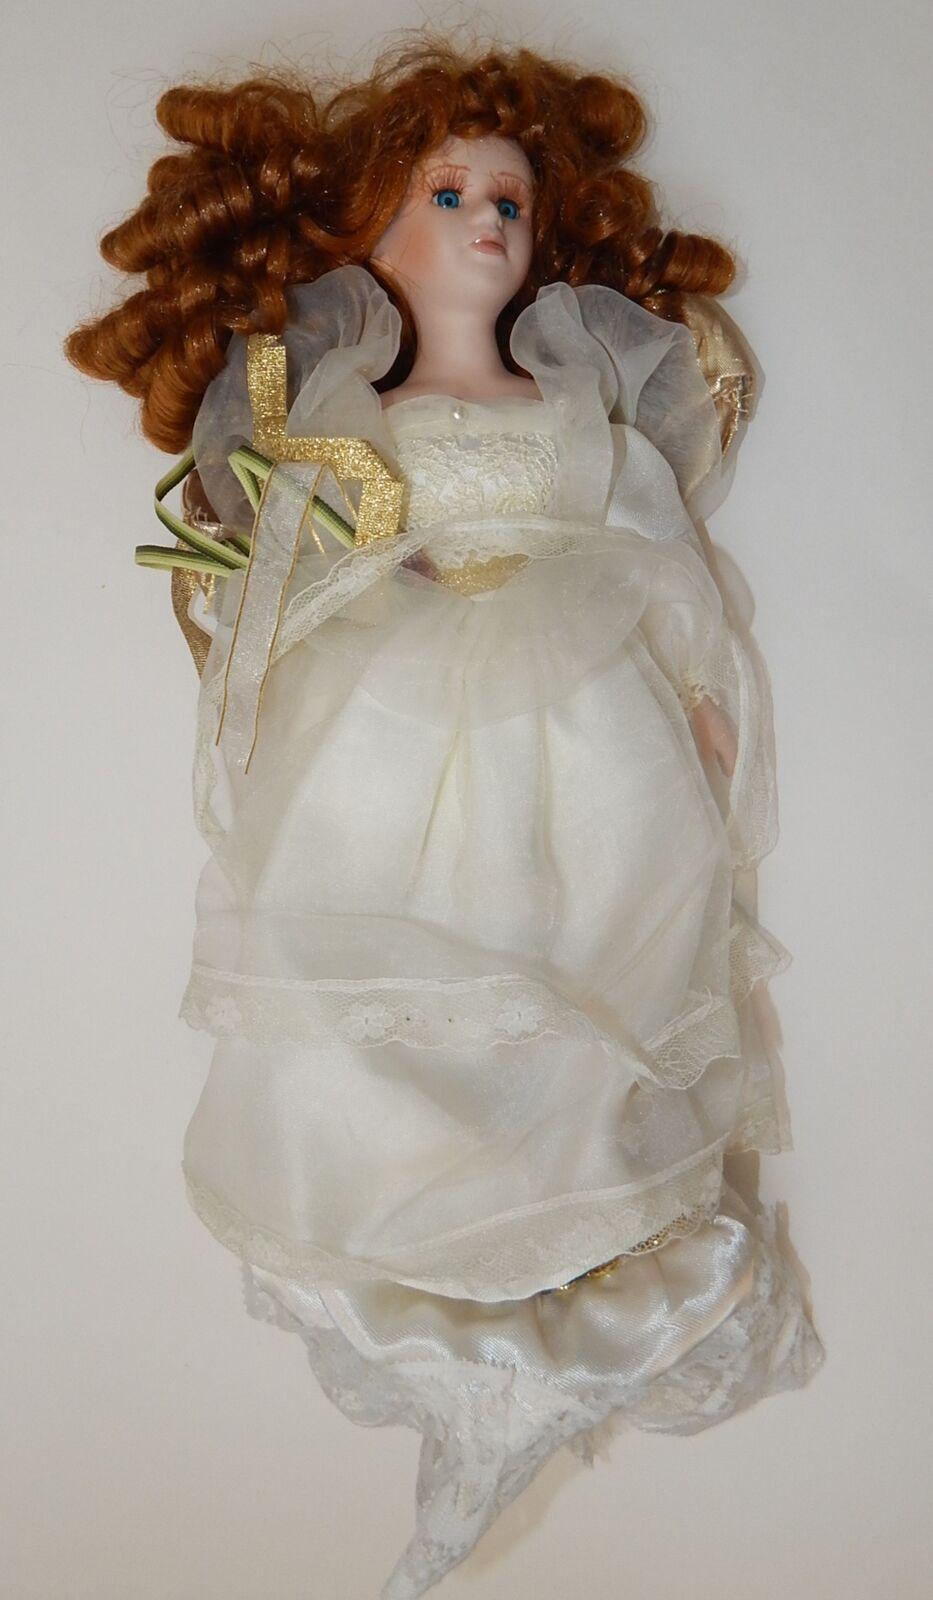 Vintage Porcelain Doll Goldenvale 1-2000 Long Dark braun Hair Curled R17841